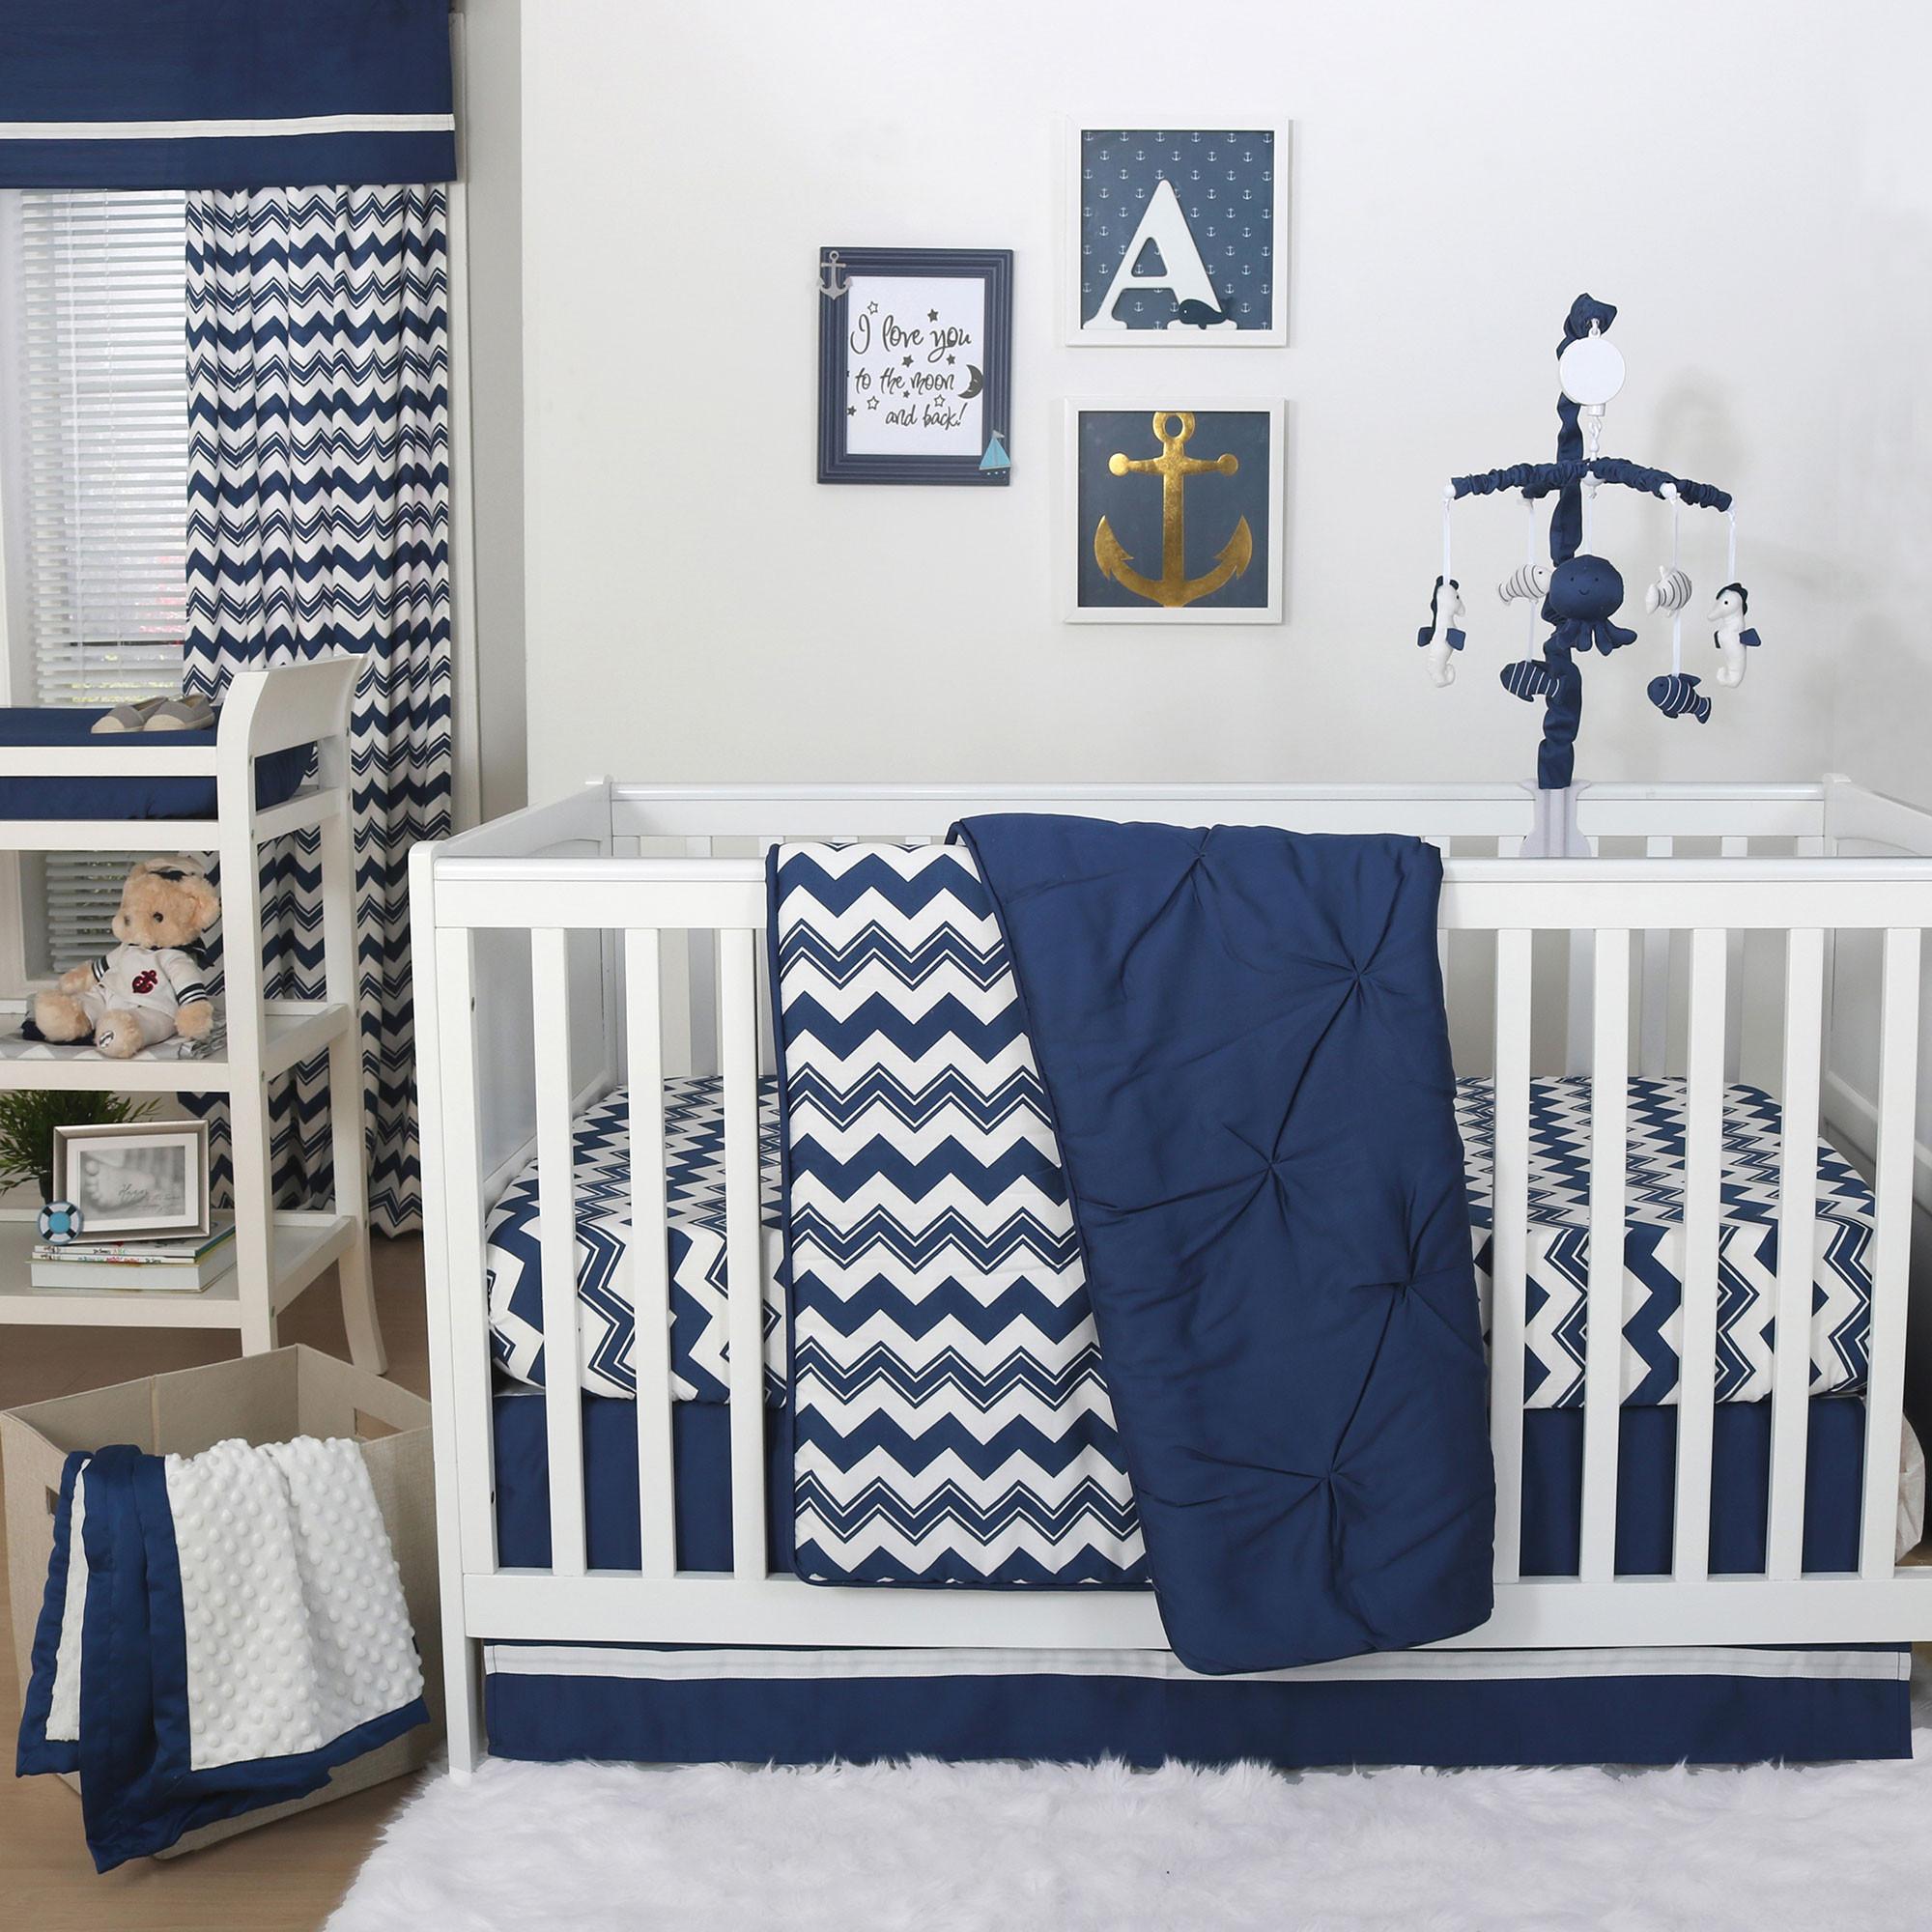 Baby Boy Bedroom Sets  The Peanut Shell 4 Piece Baby Boy Crib Bedding Set Navy